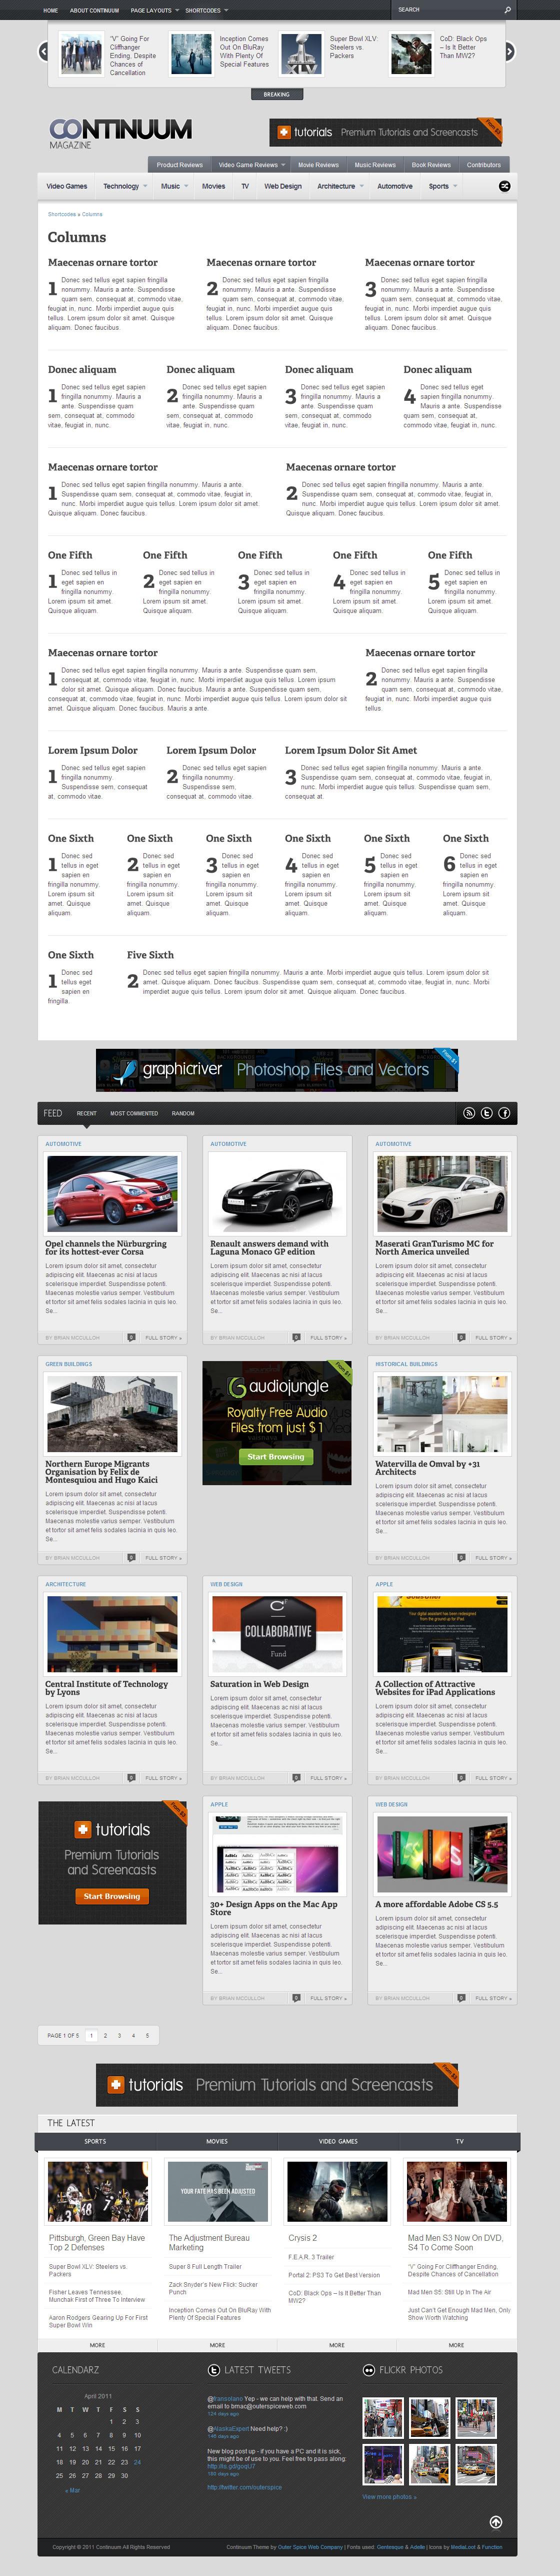 Continuum - Magazine HTML Theme